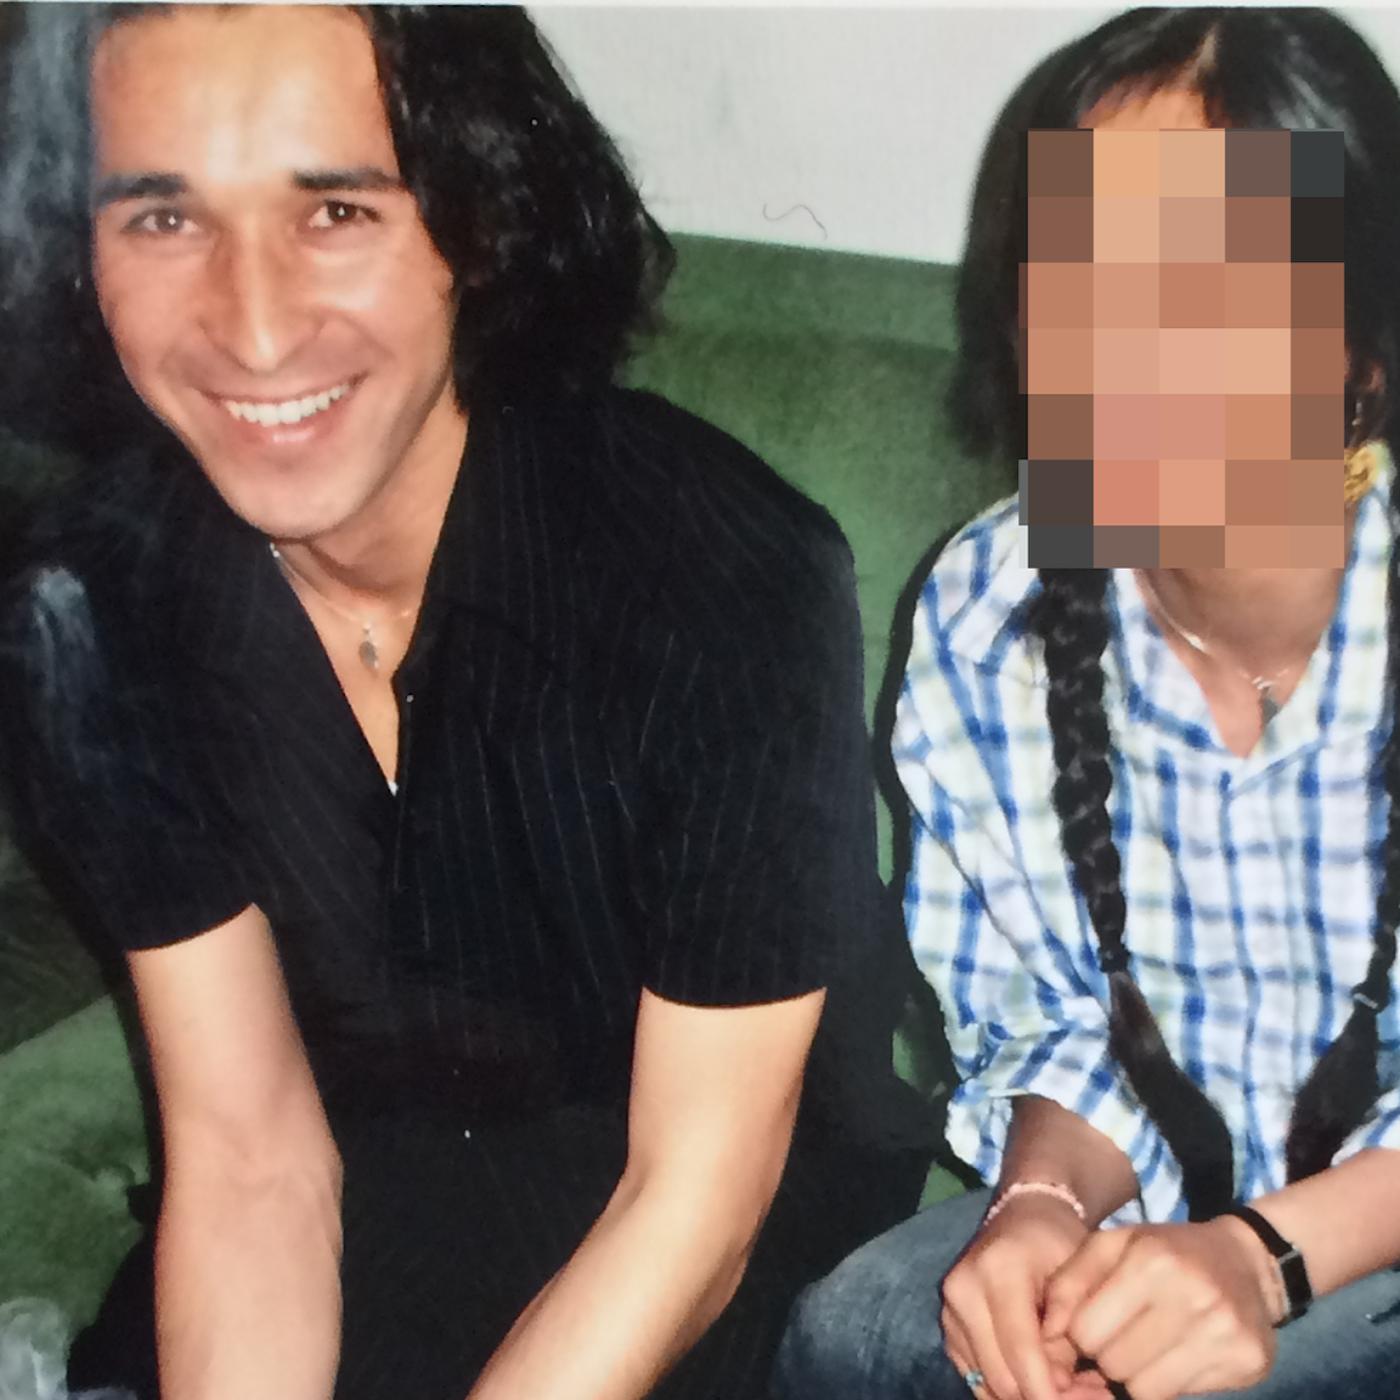 Hedersmordet på Abbas Rezai